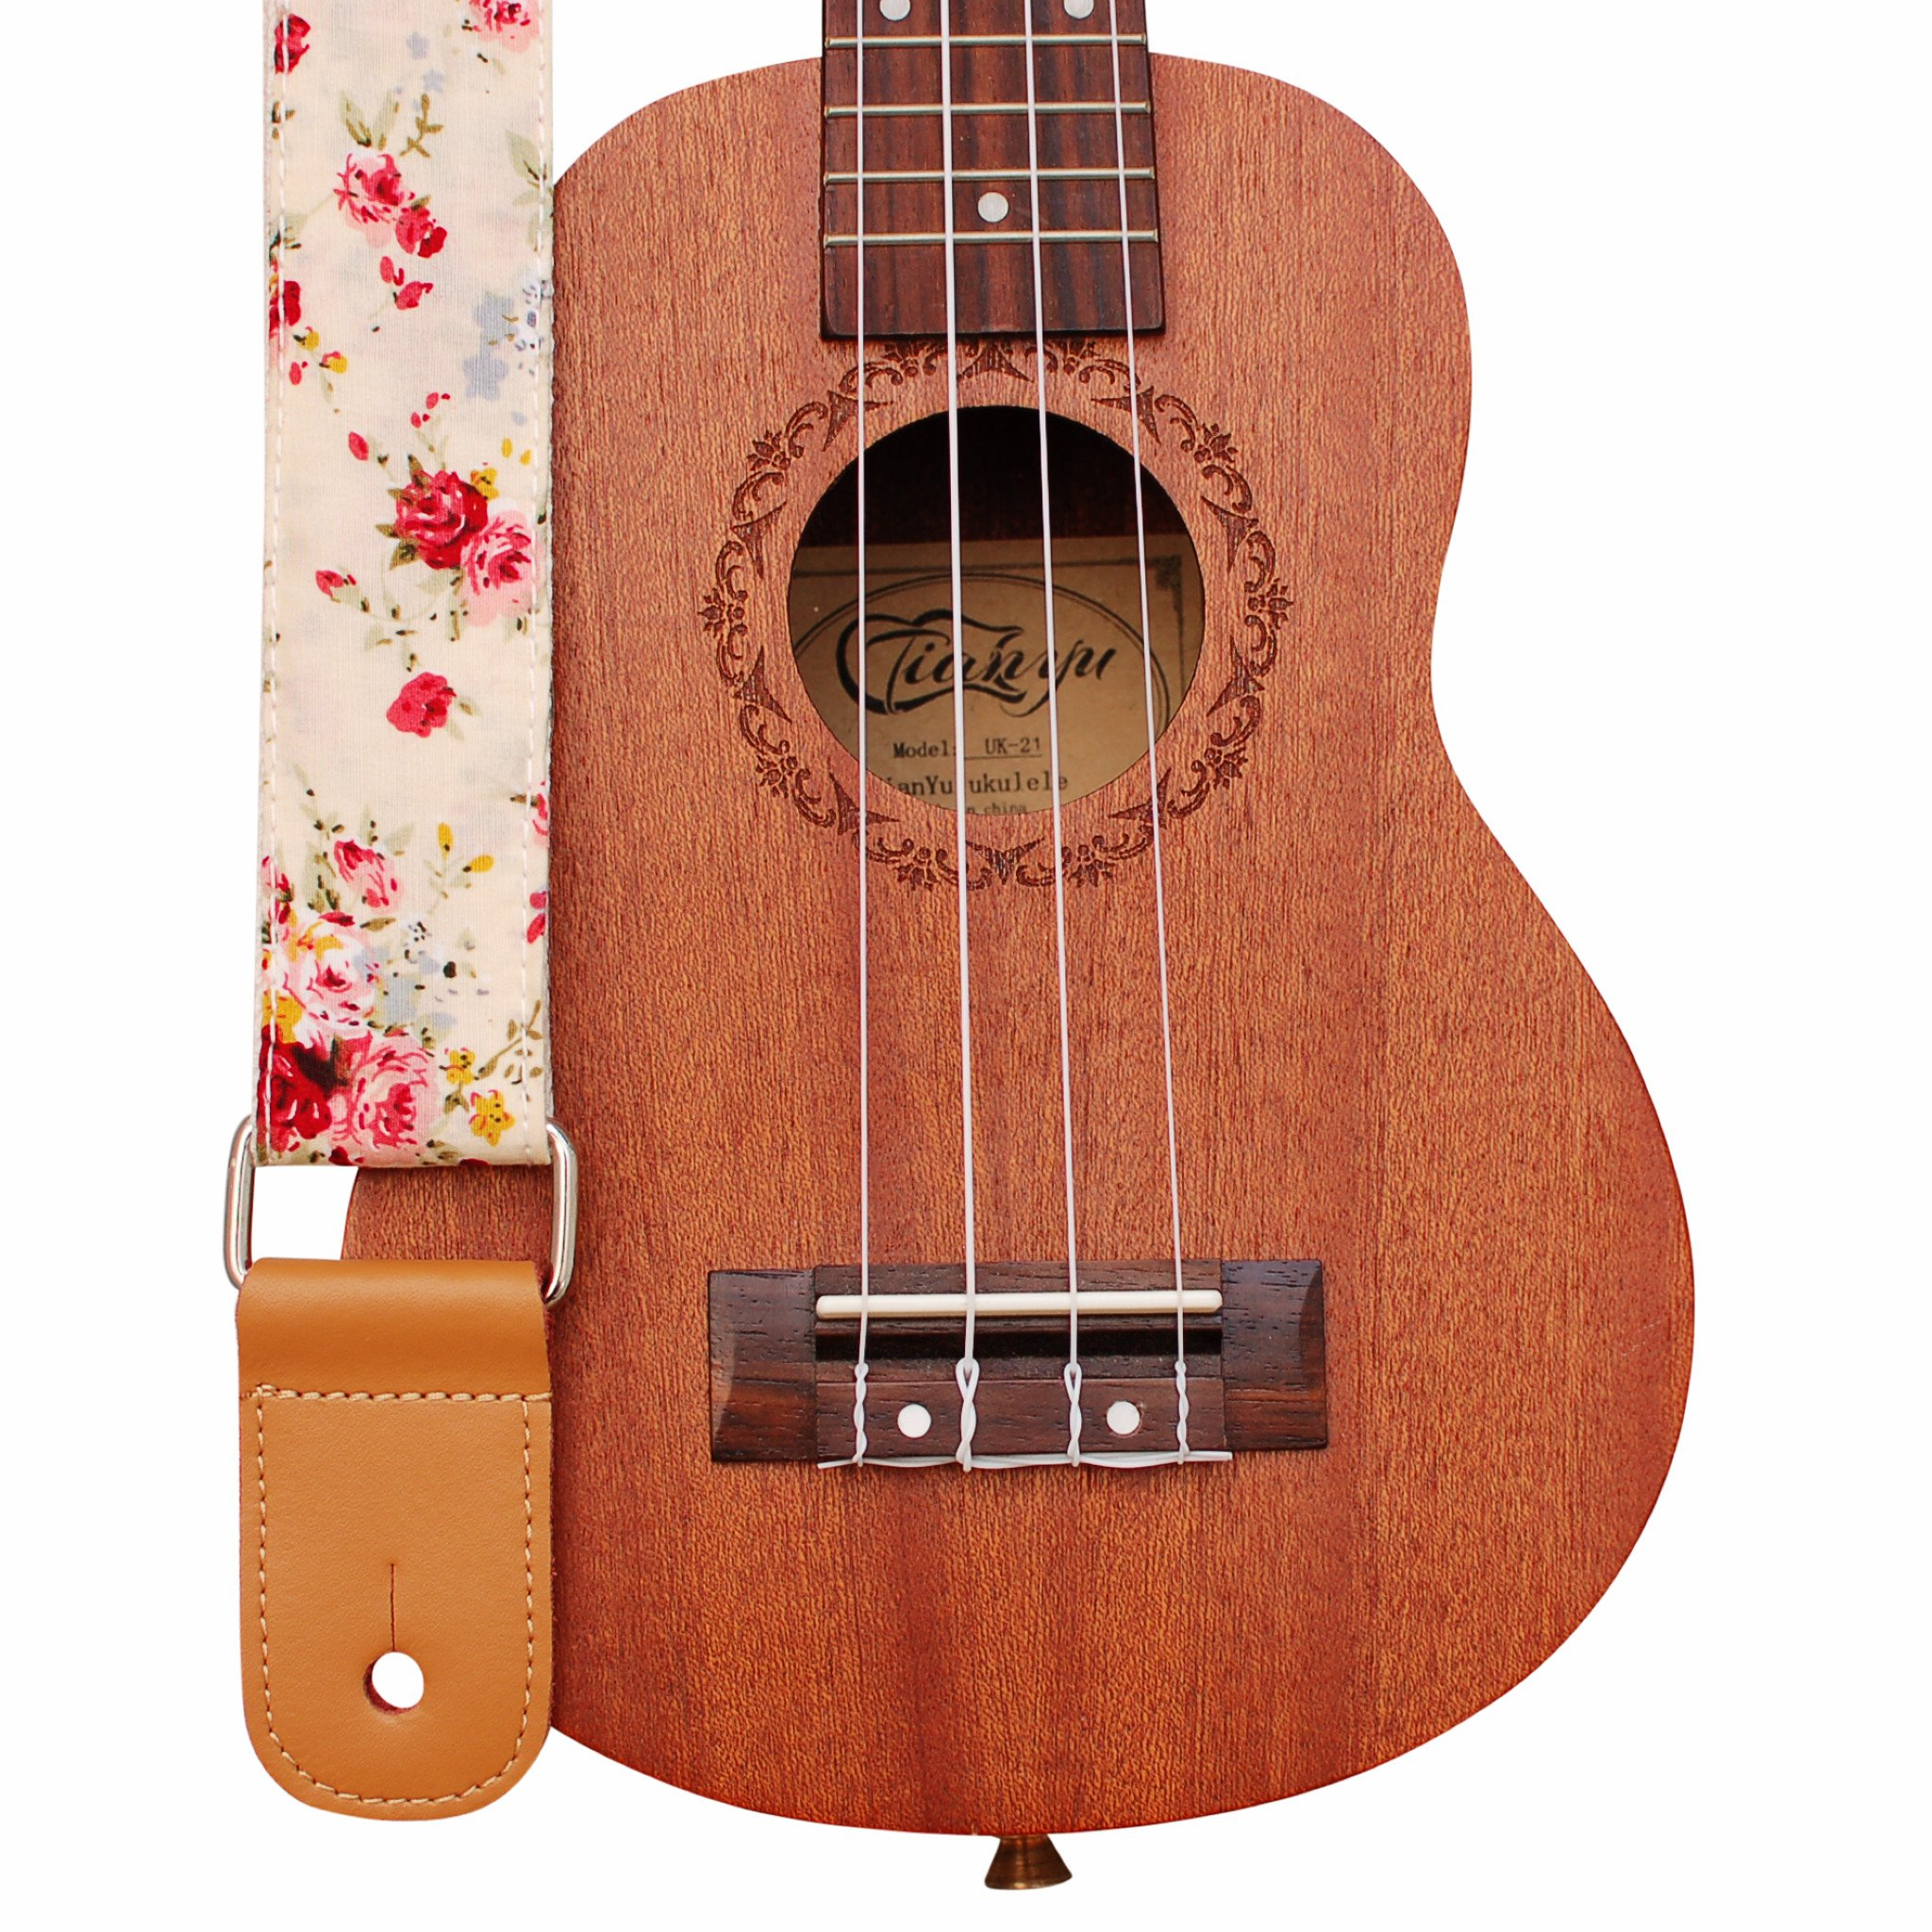 "MUSIC FIRST Original Design ""Rosa Multiflora in Cream"" Soft Cotton & Genuine Leather Ukulele Strap Ukulele Shoulder Strap"